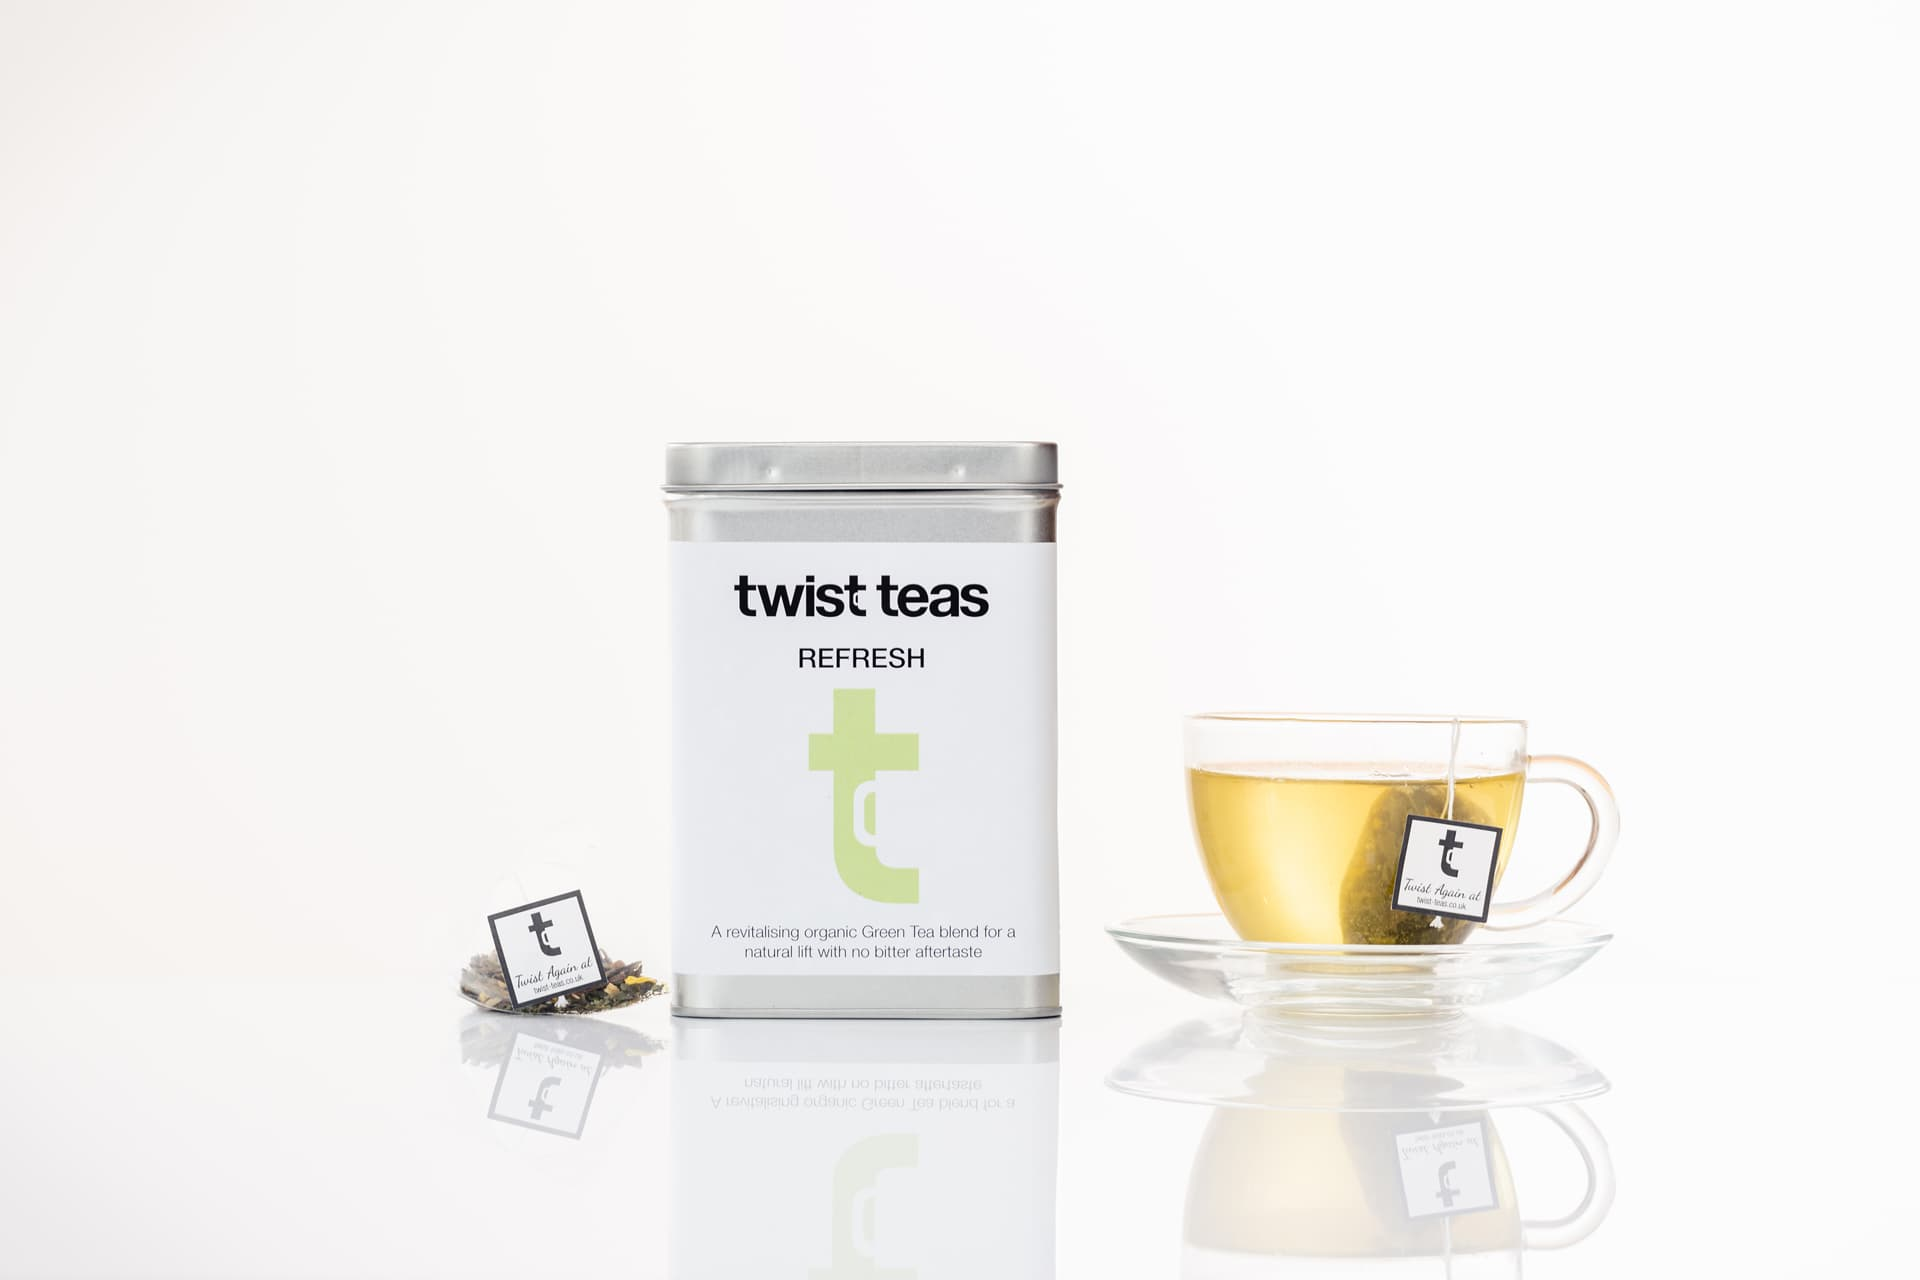 Twist Teas Refresh Tea in cup